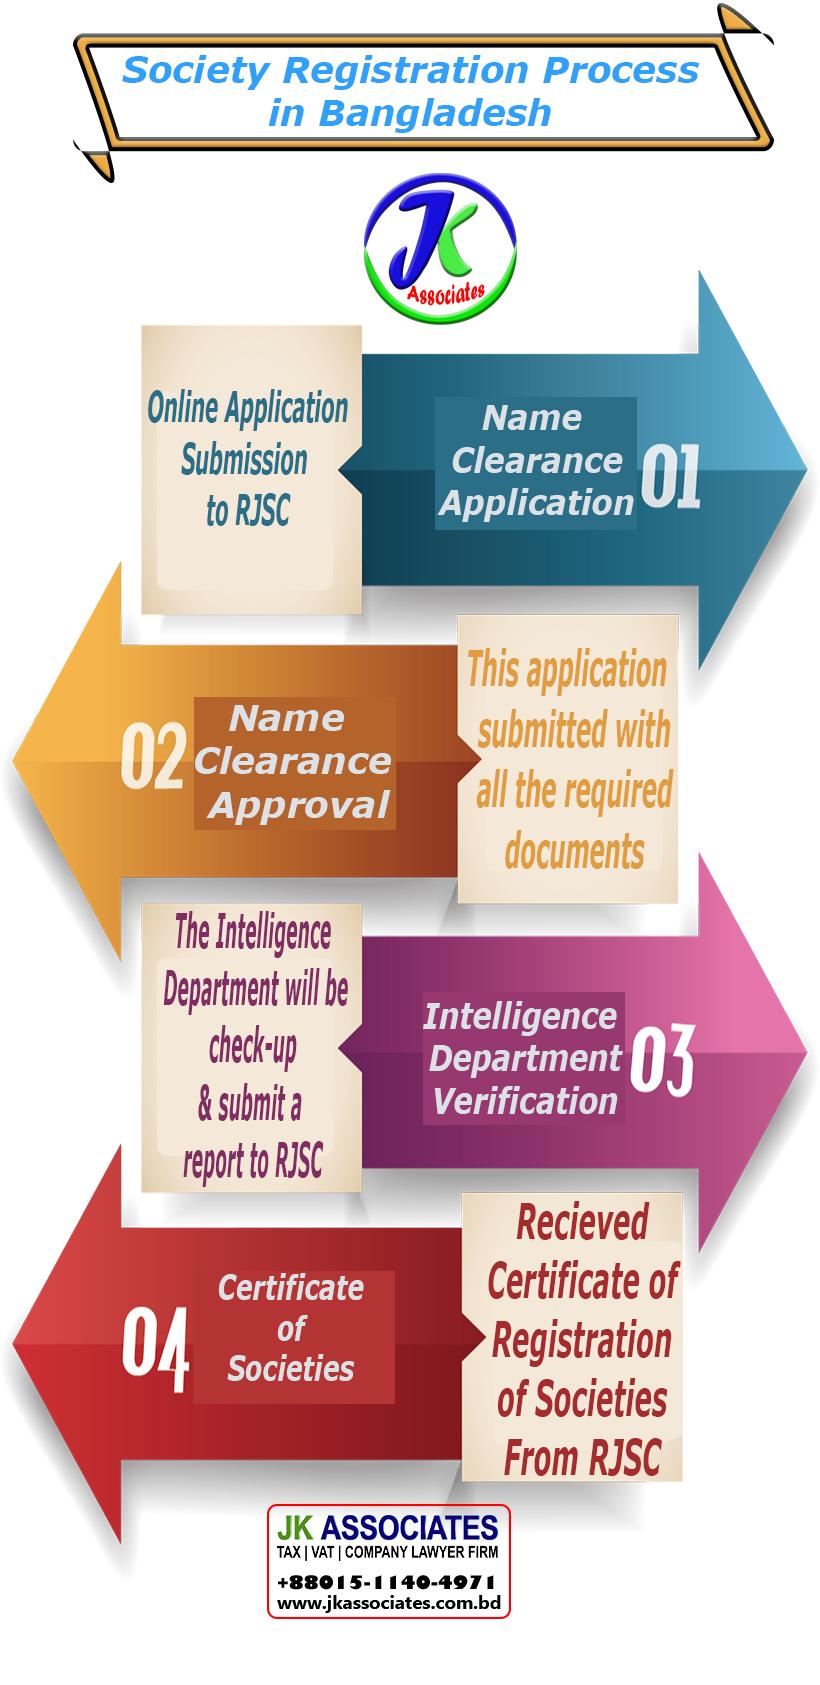 society-registration-in-bangladesh-jk-associates-tax-lawyer-vat-lawyer-company-registration-company-formation-company-lawyer-trademark-trade-mark-copyright-copy-right-patent-lawyer-in-bangladesh-trade-license-best-company-lawyer-in-dhaka